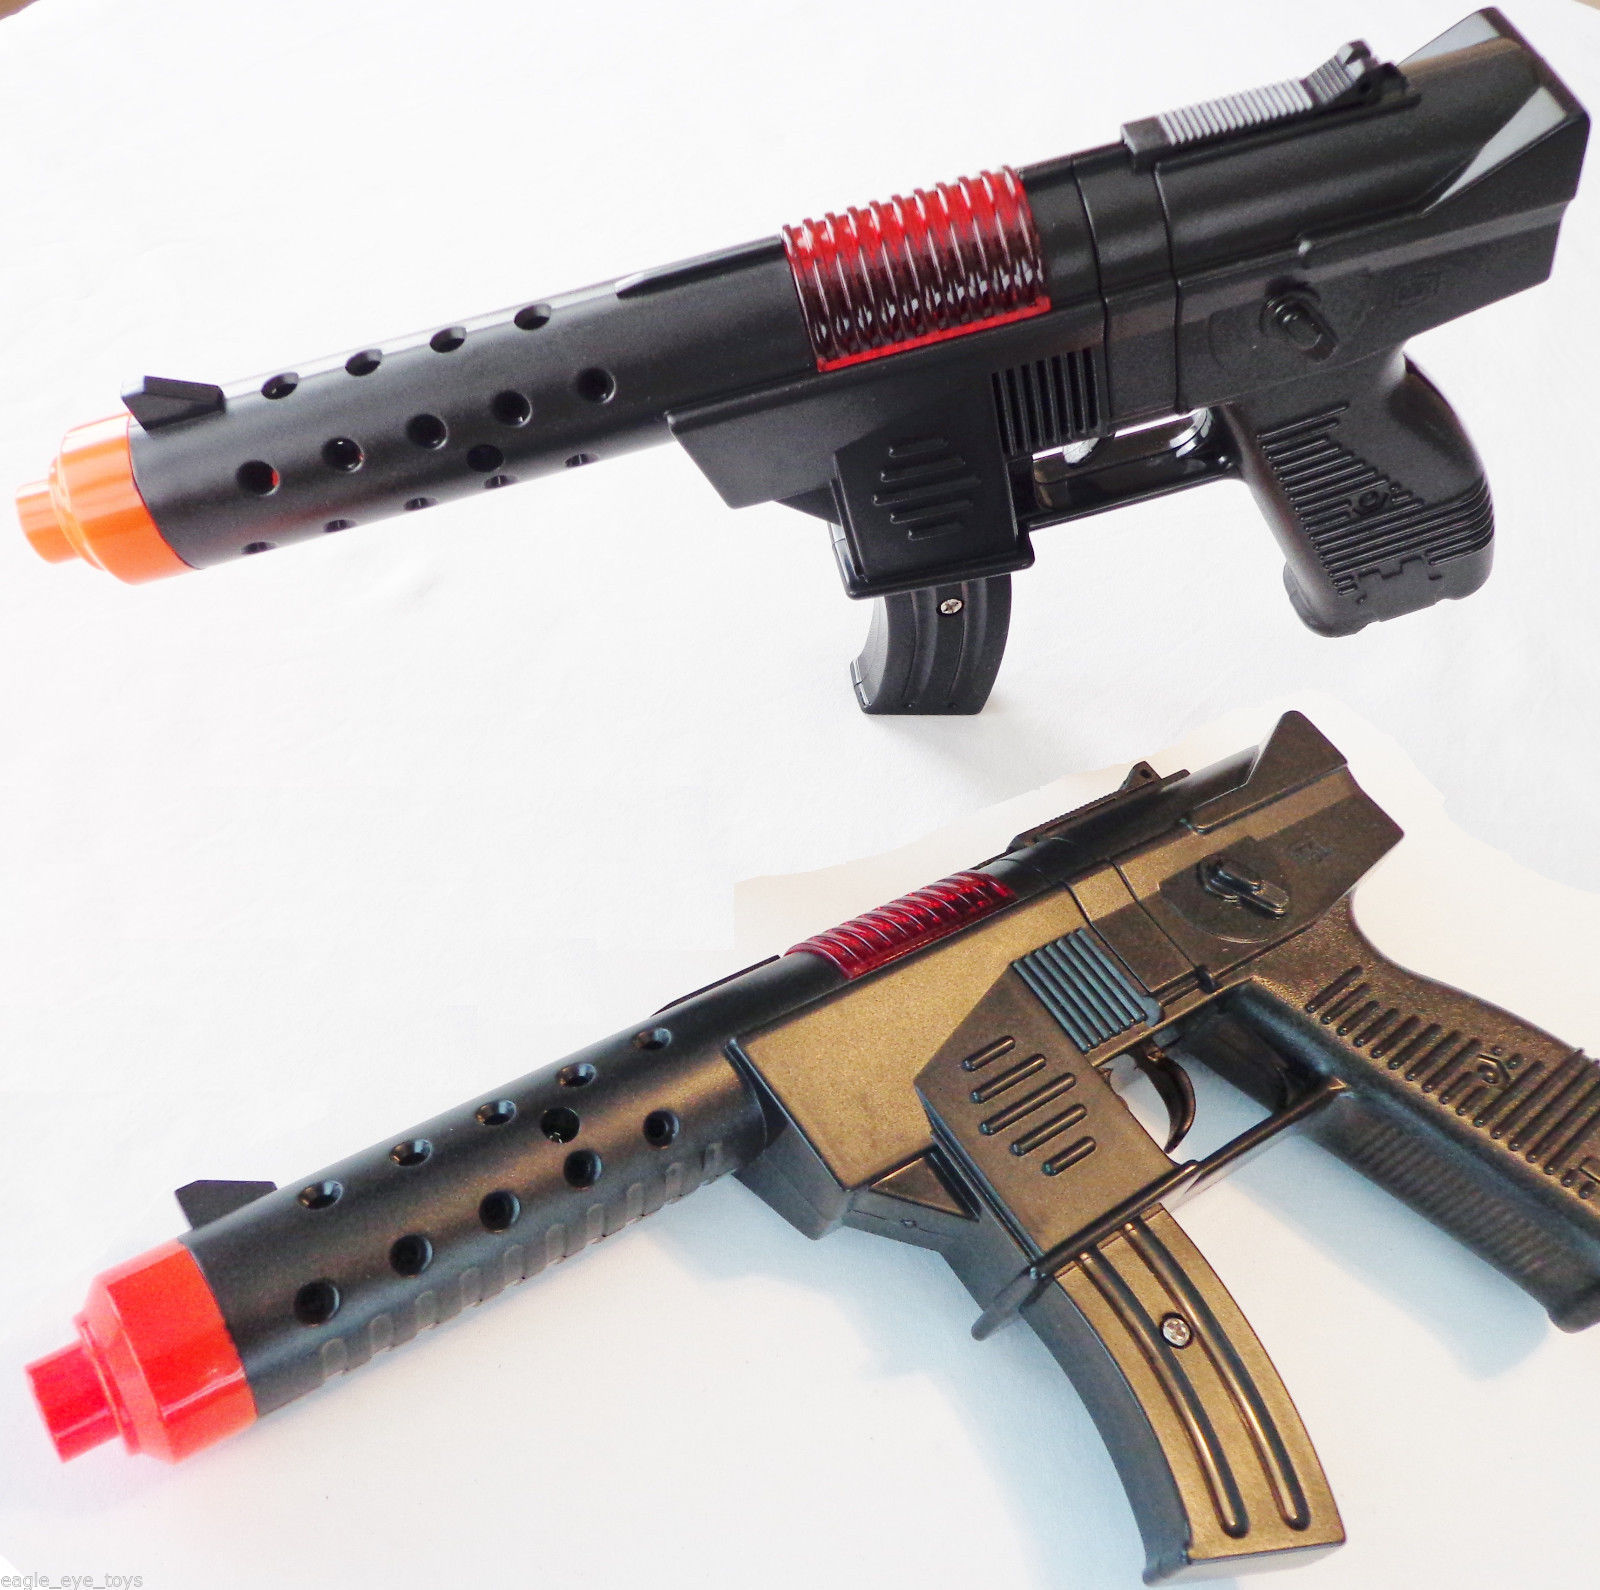 Electronic MP5 w Flashing Lights /& Sound FX 2X Toy Machine Guns M-16 Toy Rifle